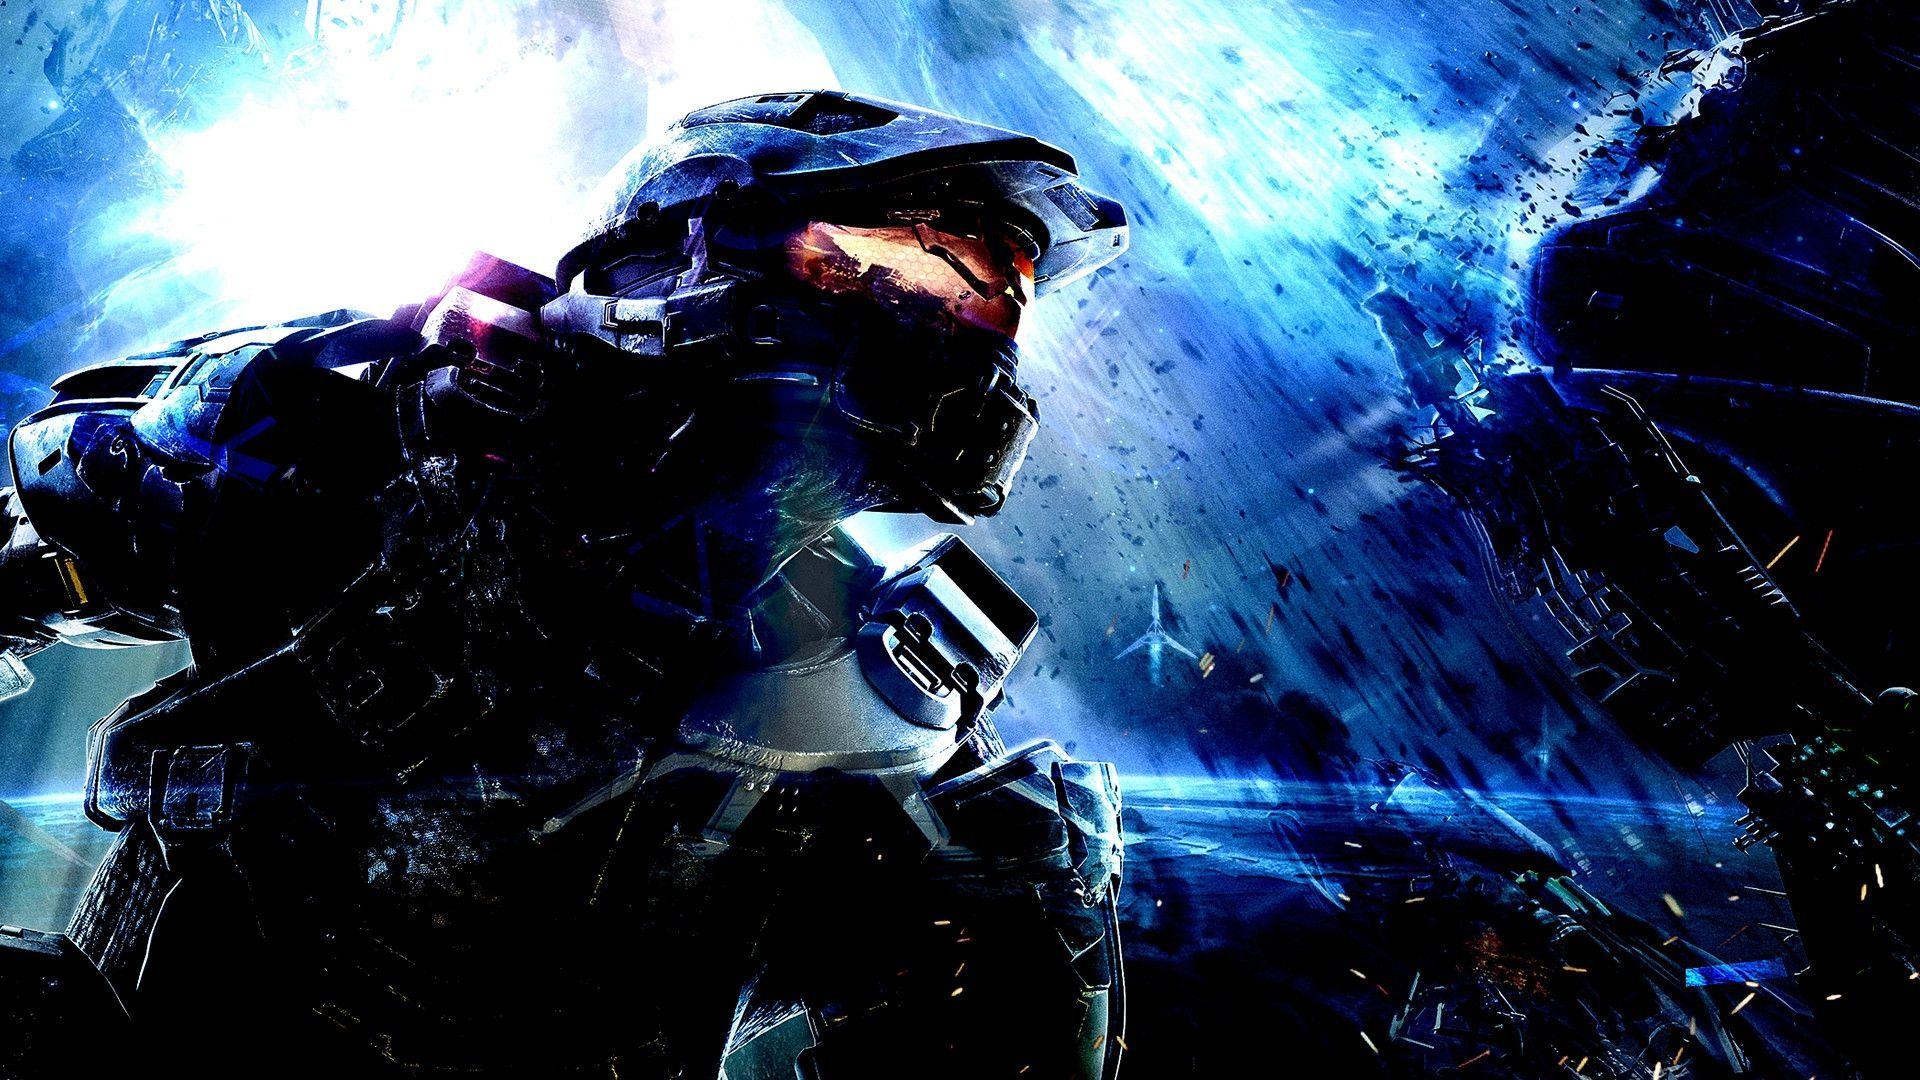 Halo Masterchief HD desktop wallpaper Widescreen High